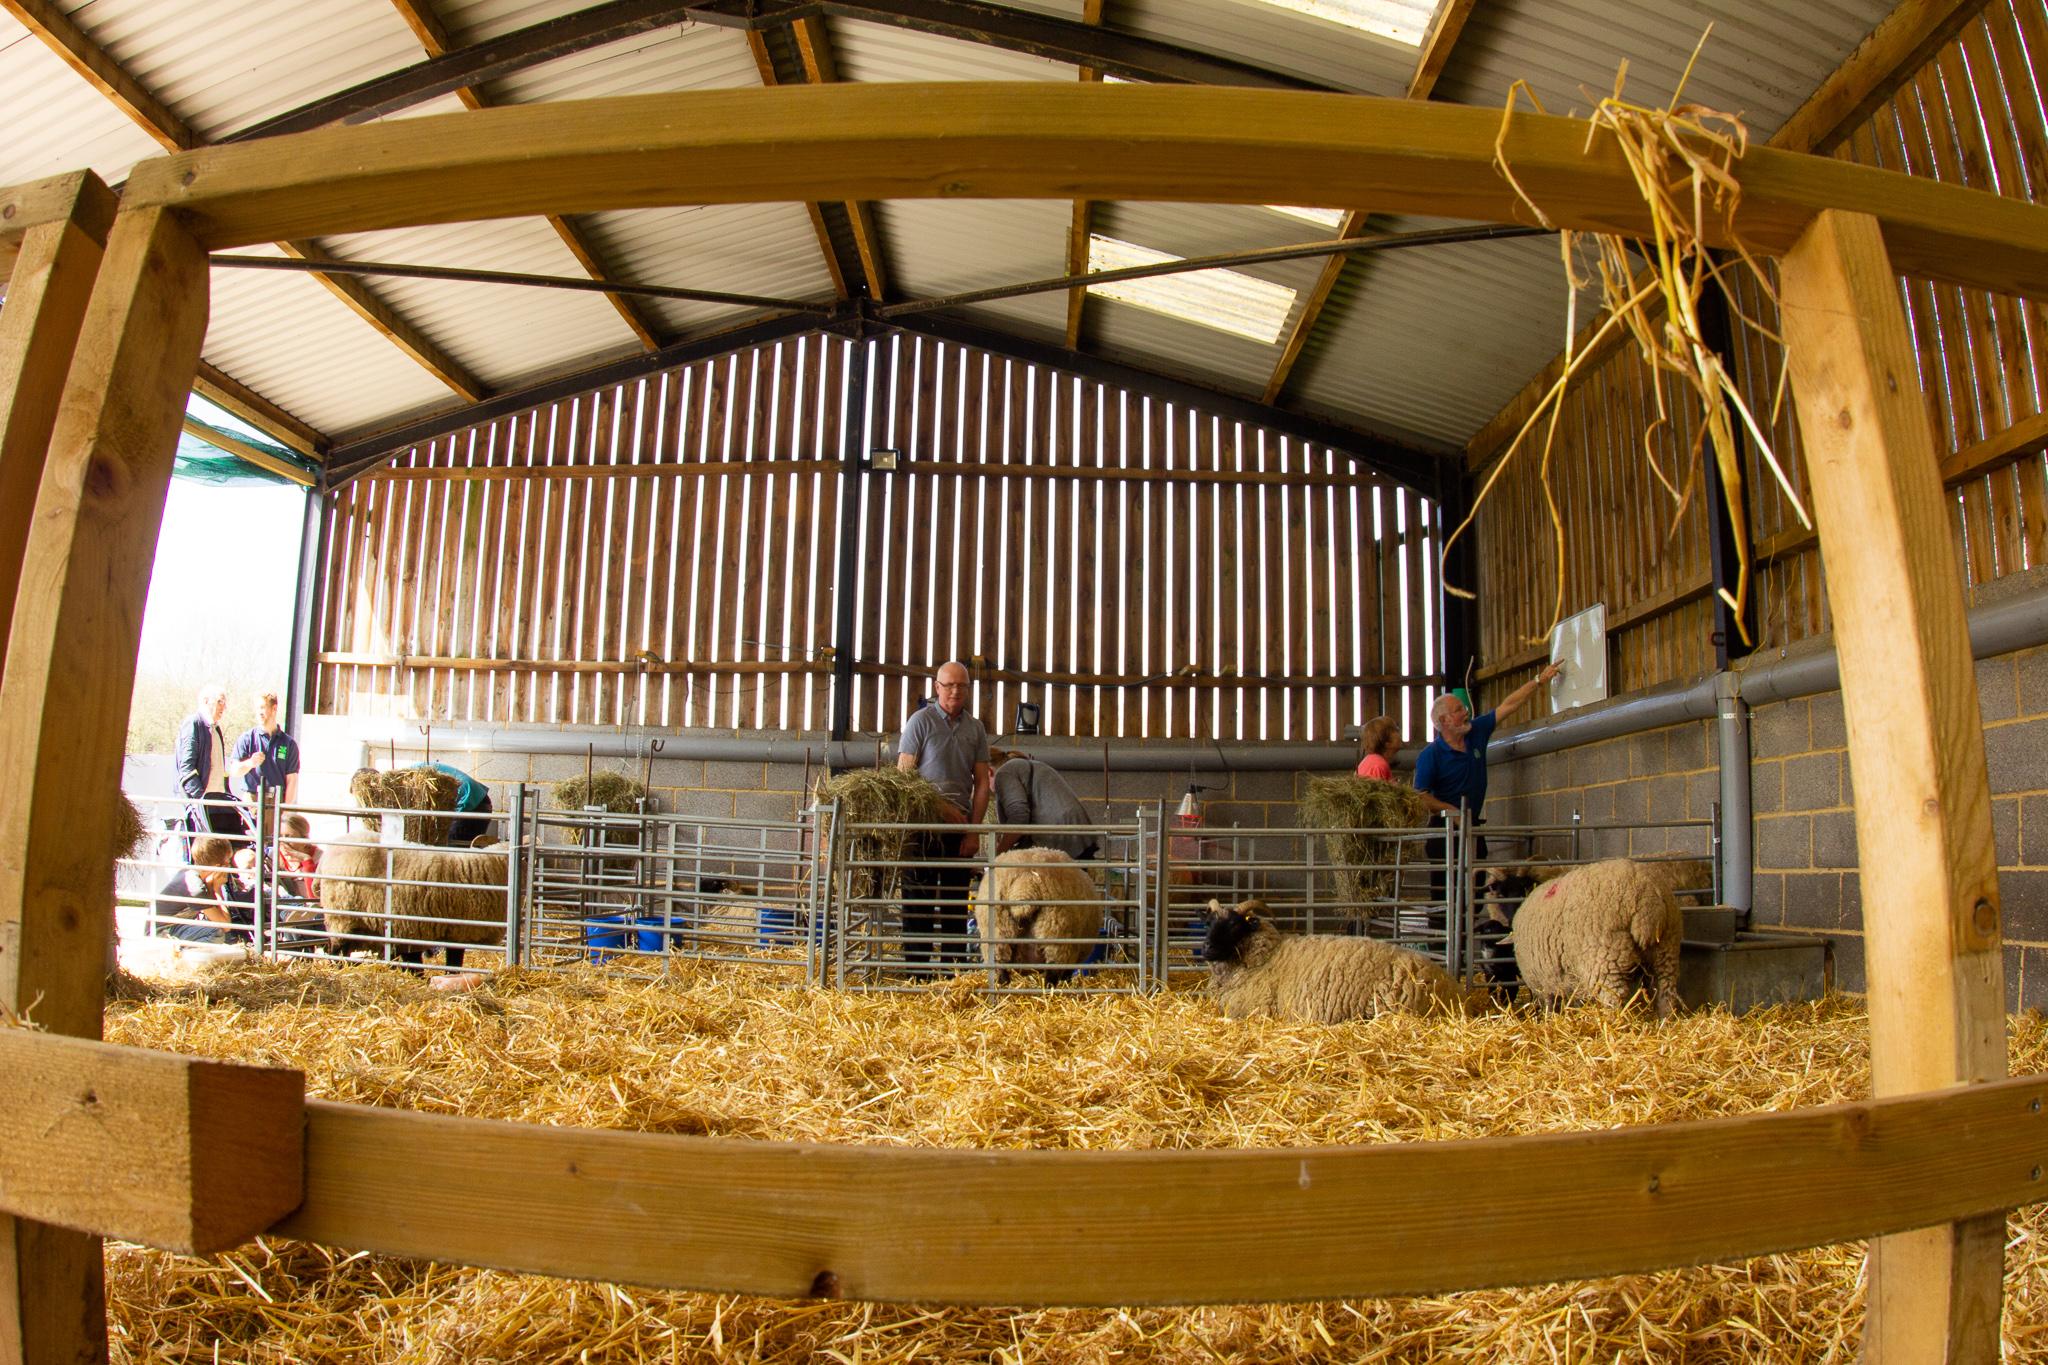 The lambing barn